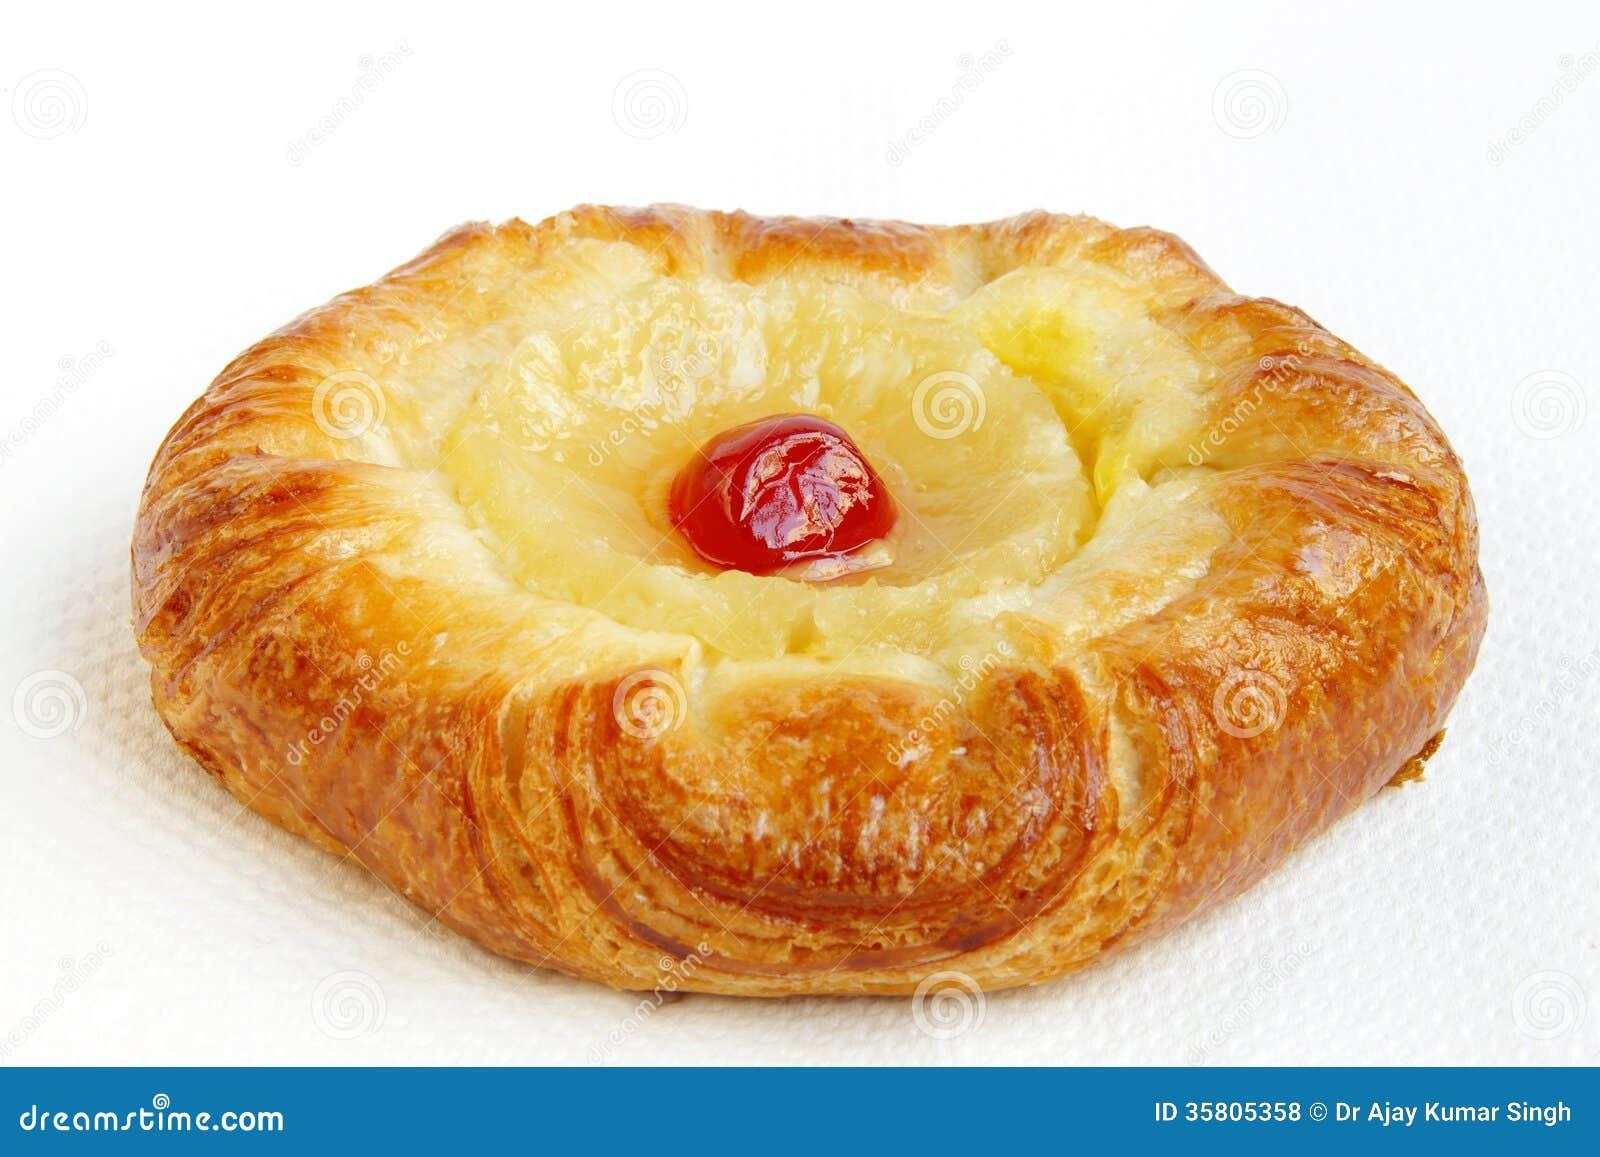 recipe: fruit danish calories [1]